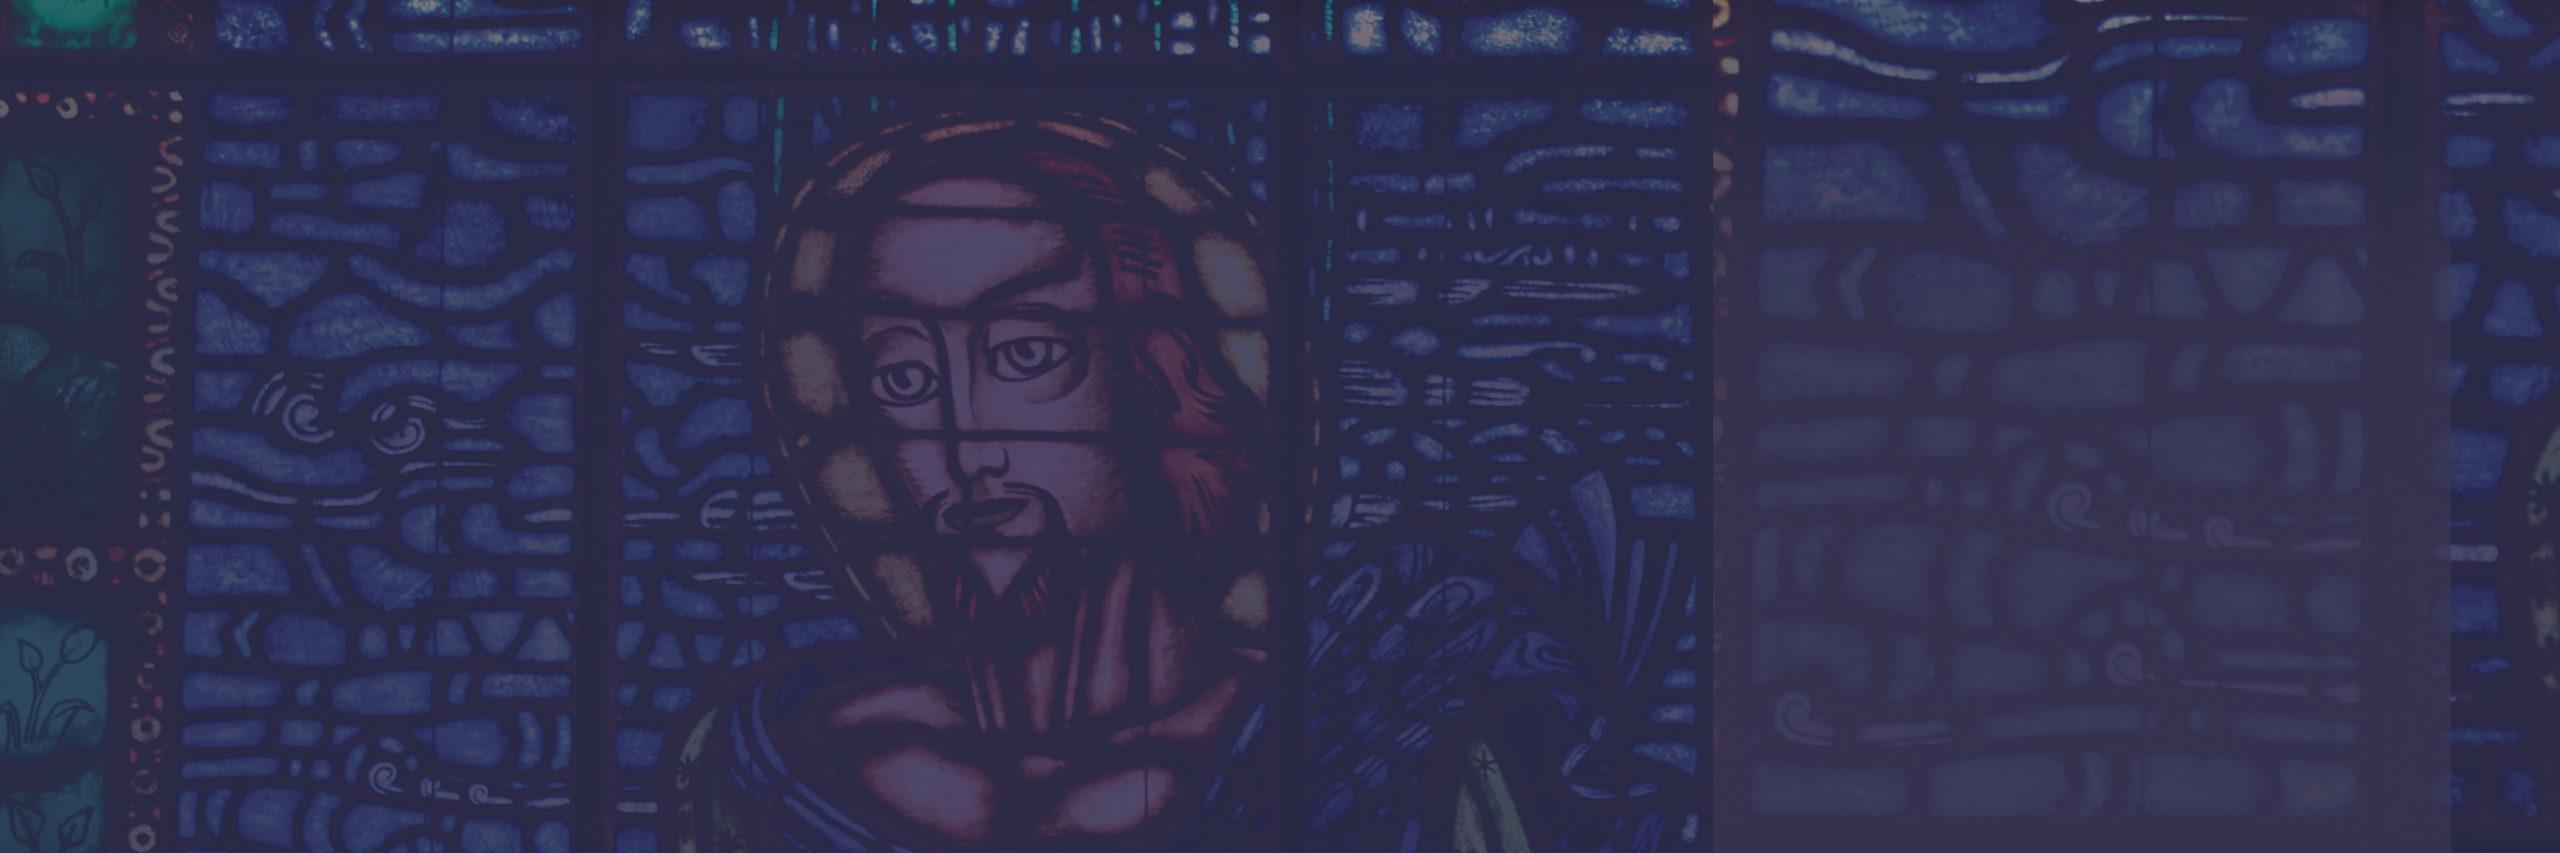 Jesus Glass WEB banner v1